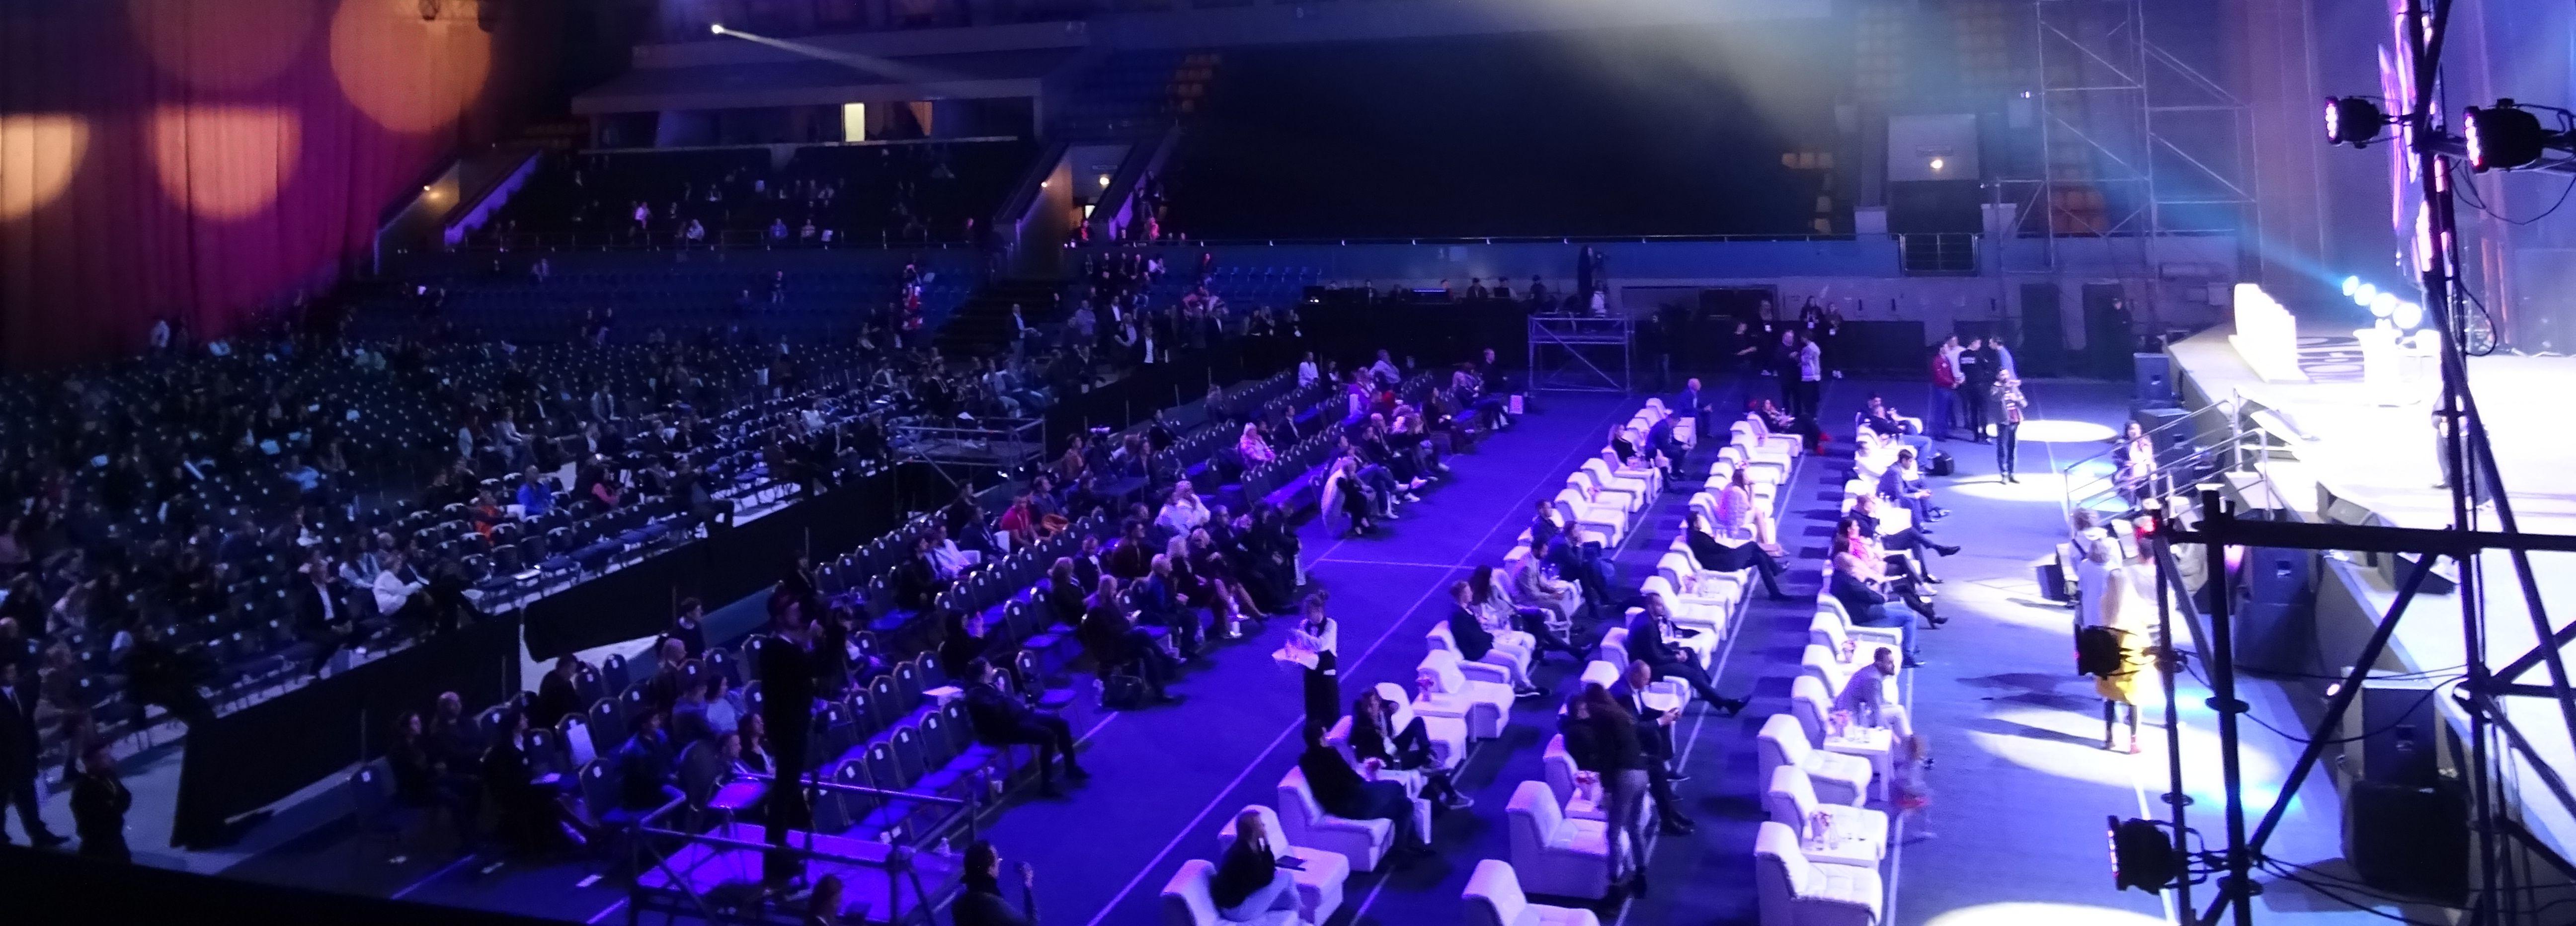 Olerom-Forum-2018-Kyiv-Ukraine-18-59-Event-Hall-During-Speach-of-Jimmy-Wales-Founder-of-Wikipedia-2-DSC09563.jpg